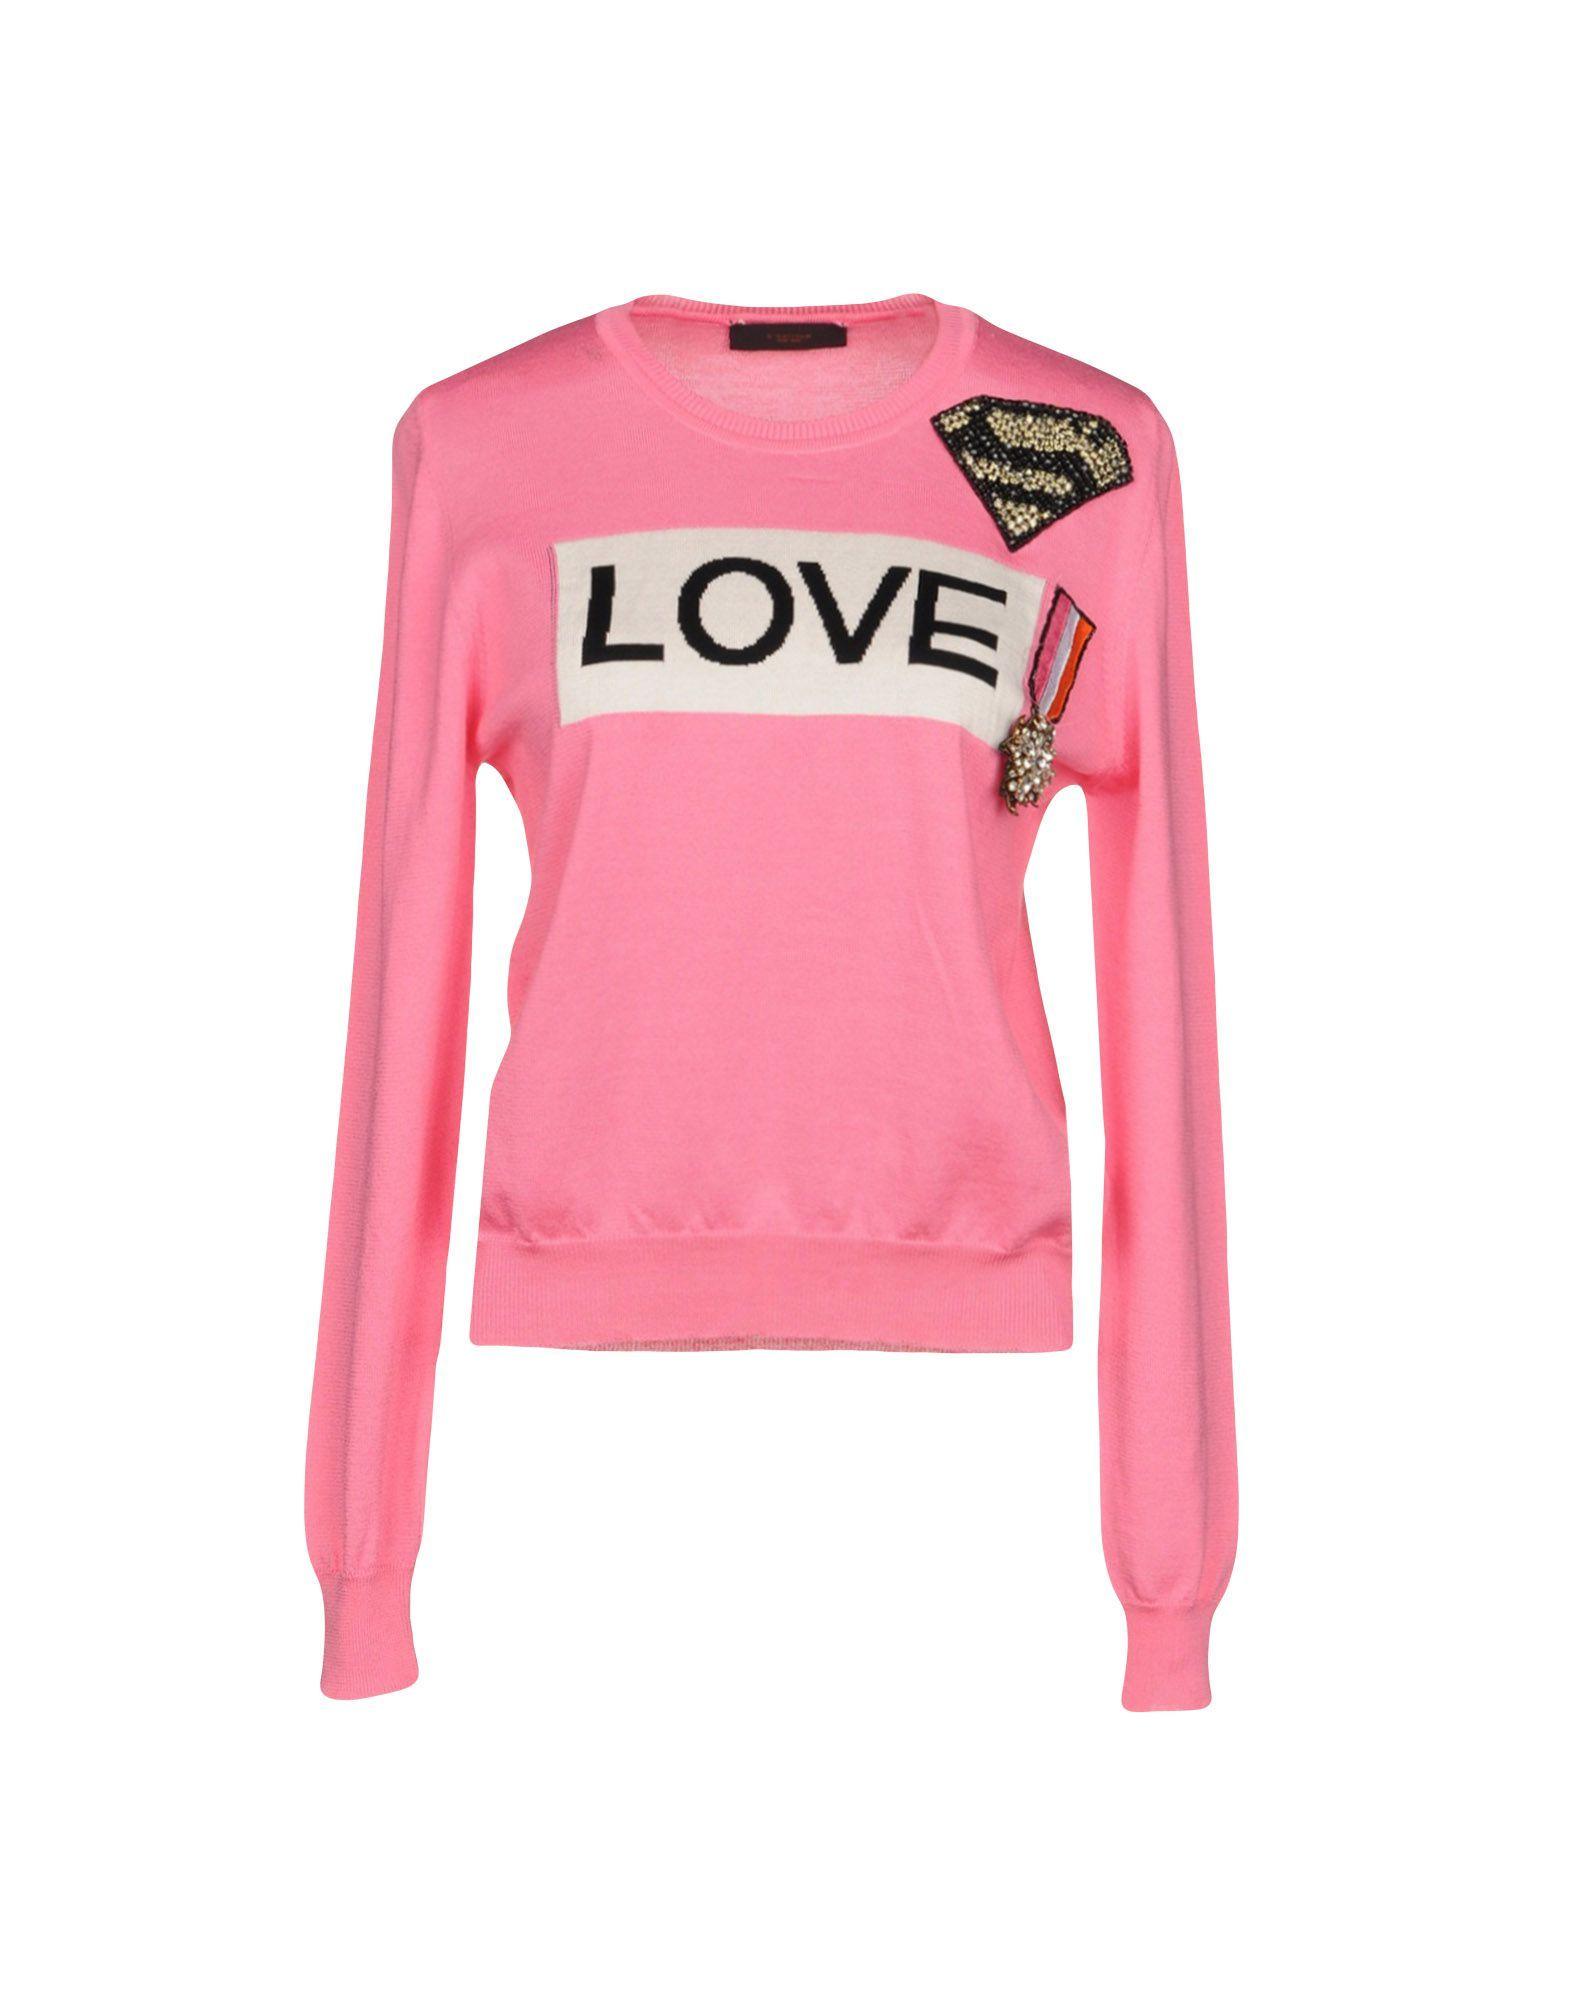 KNITWEAR L'Edition Pink Woman Cotton